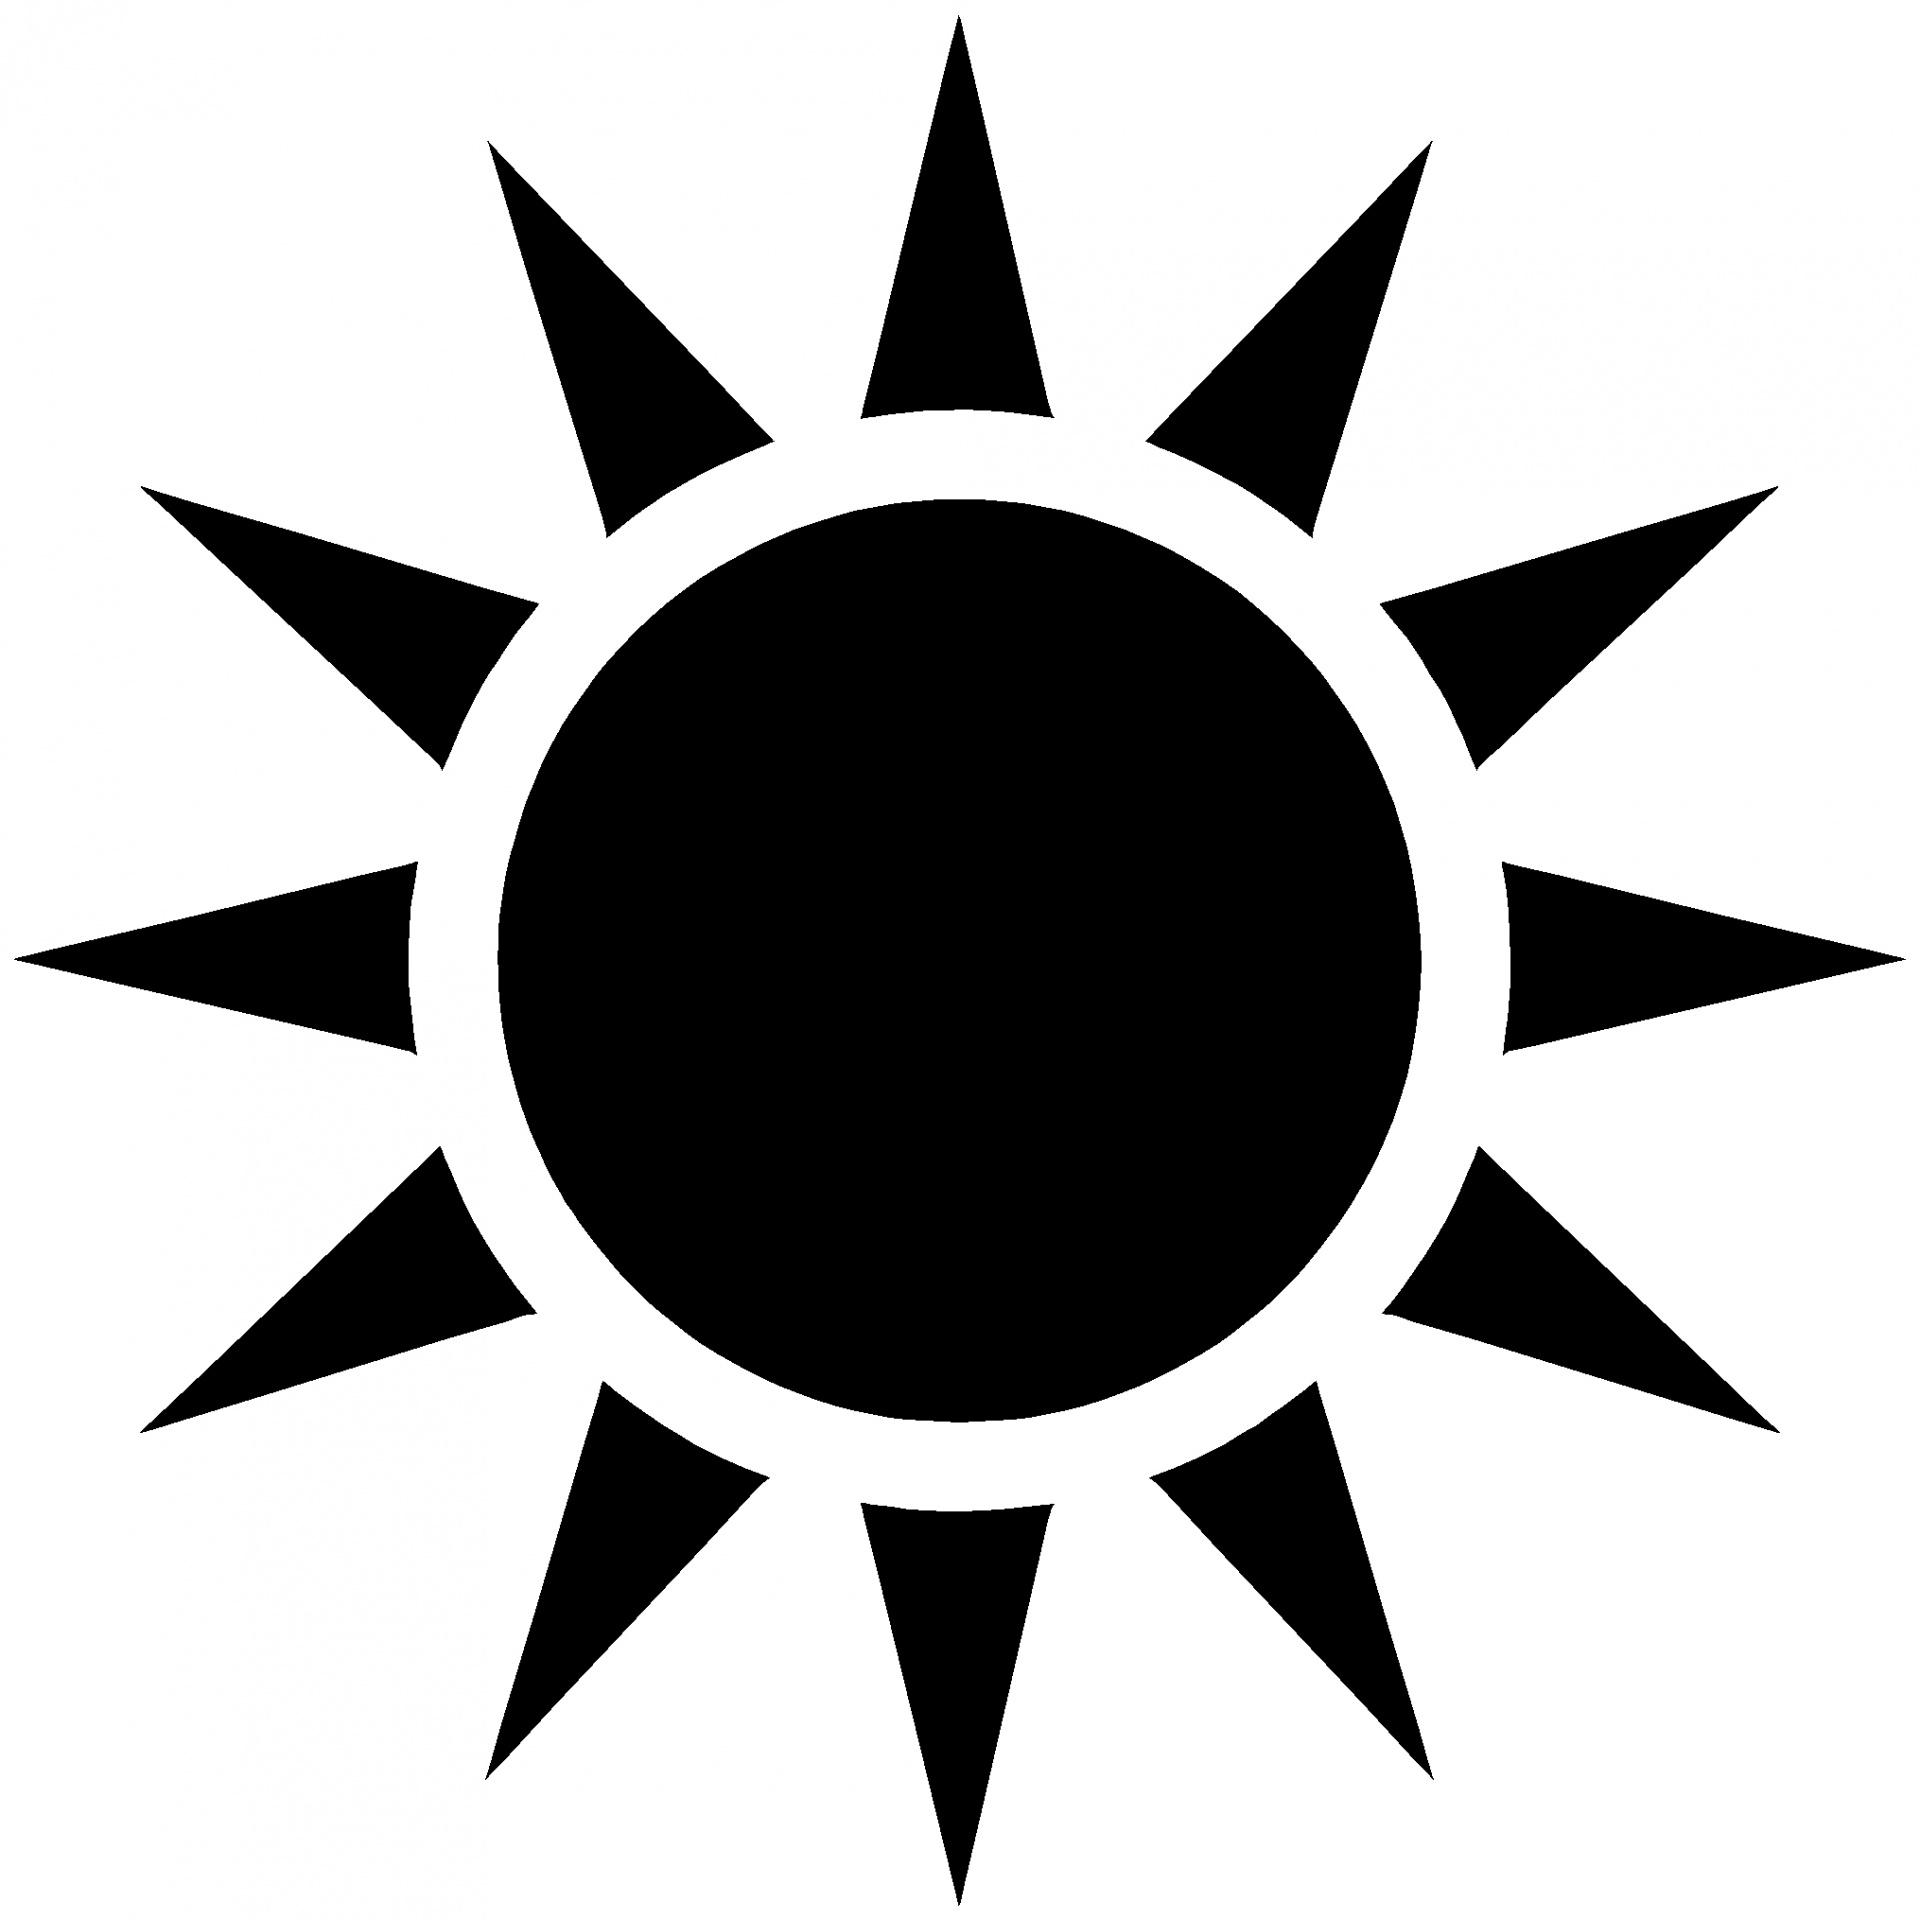 1920x1920 The Sun 37 Free Stock Photo